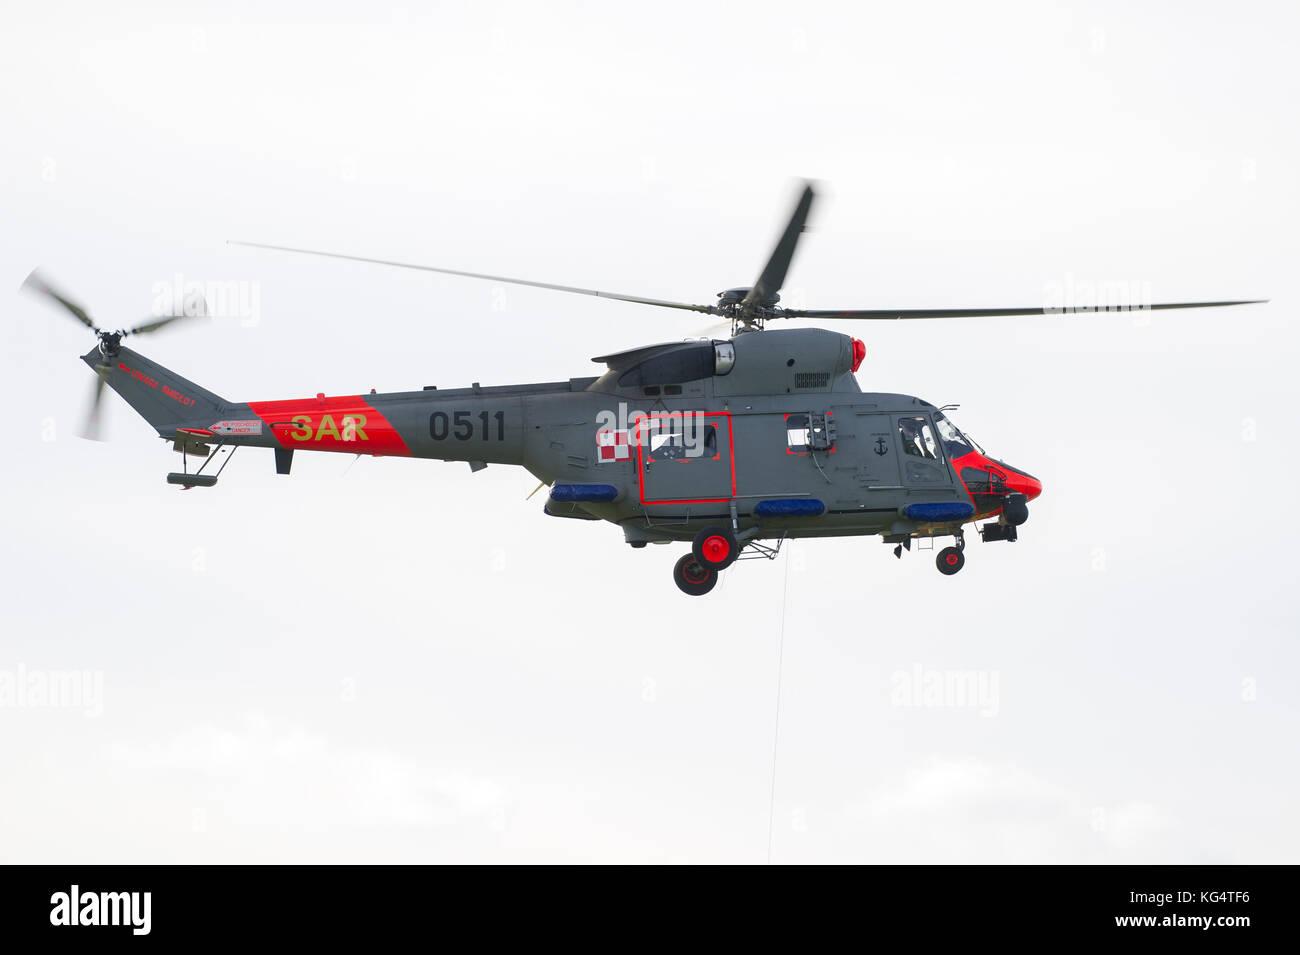 Polish Navy helicopter W-3WARM Anakonda, military version of PZL W-3 Sokol, in Gdynia, Poland. 31 October 2017 © - Stock Image